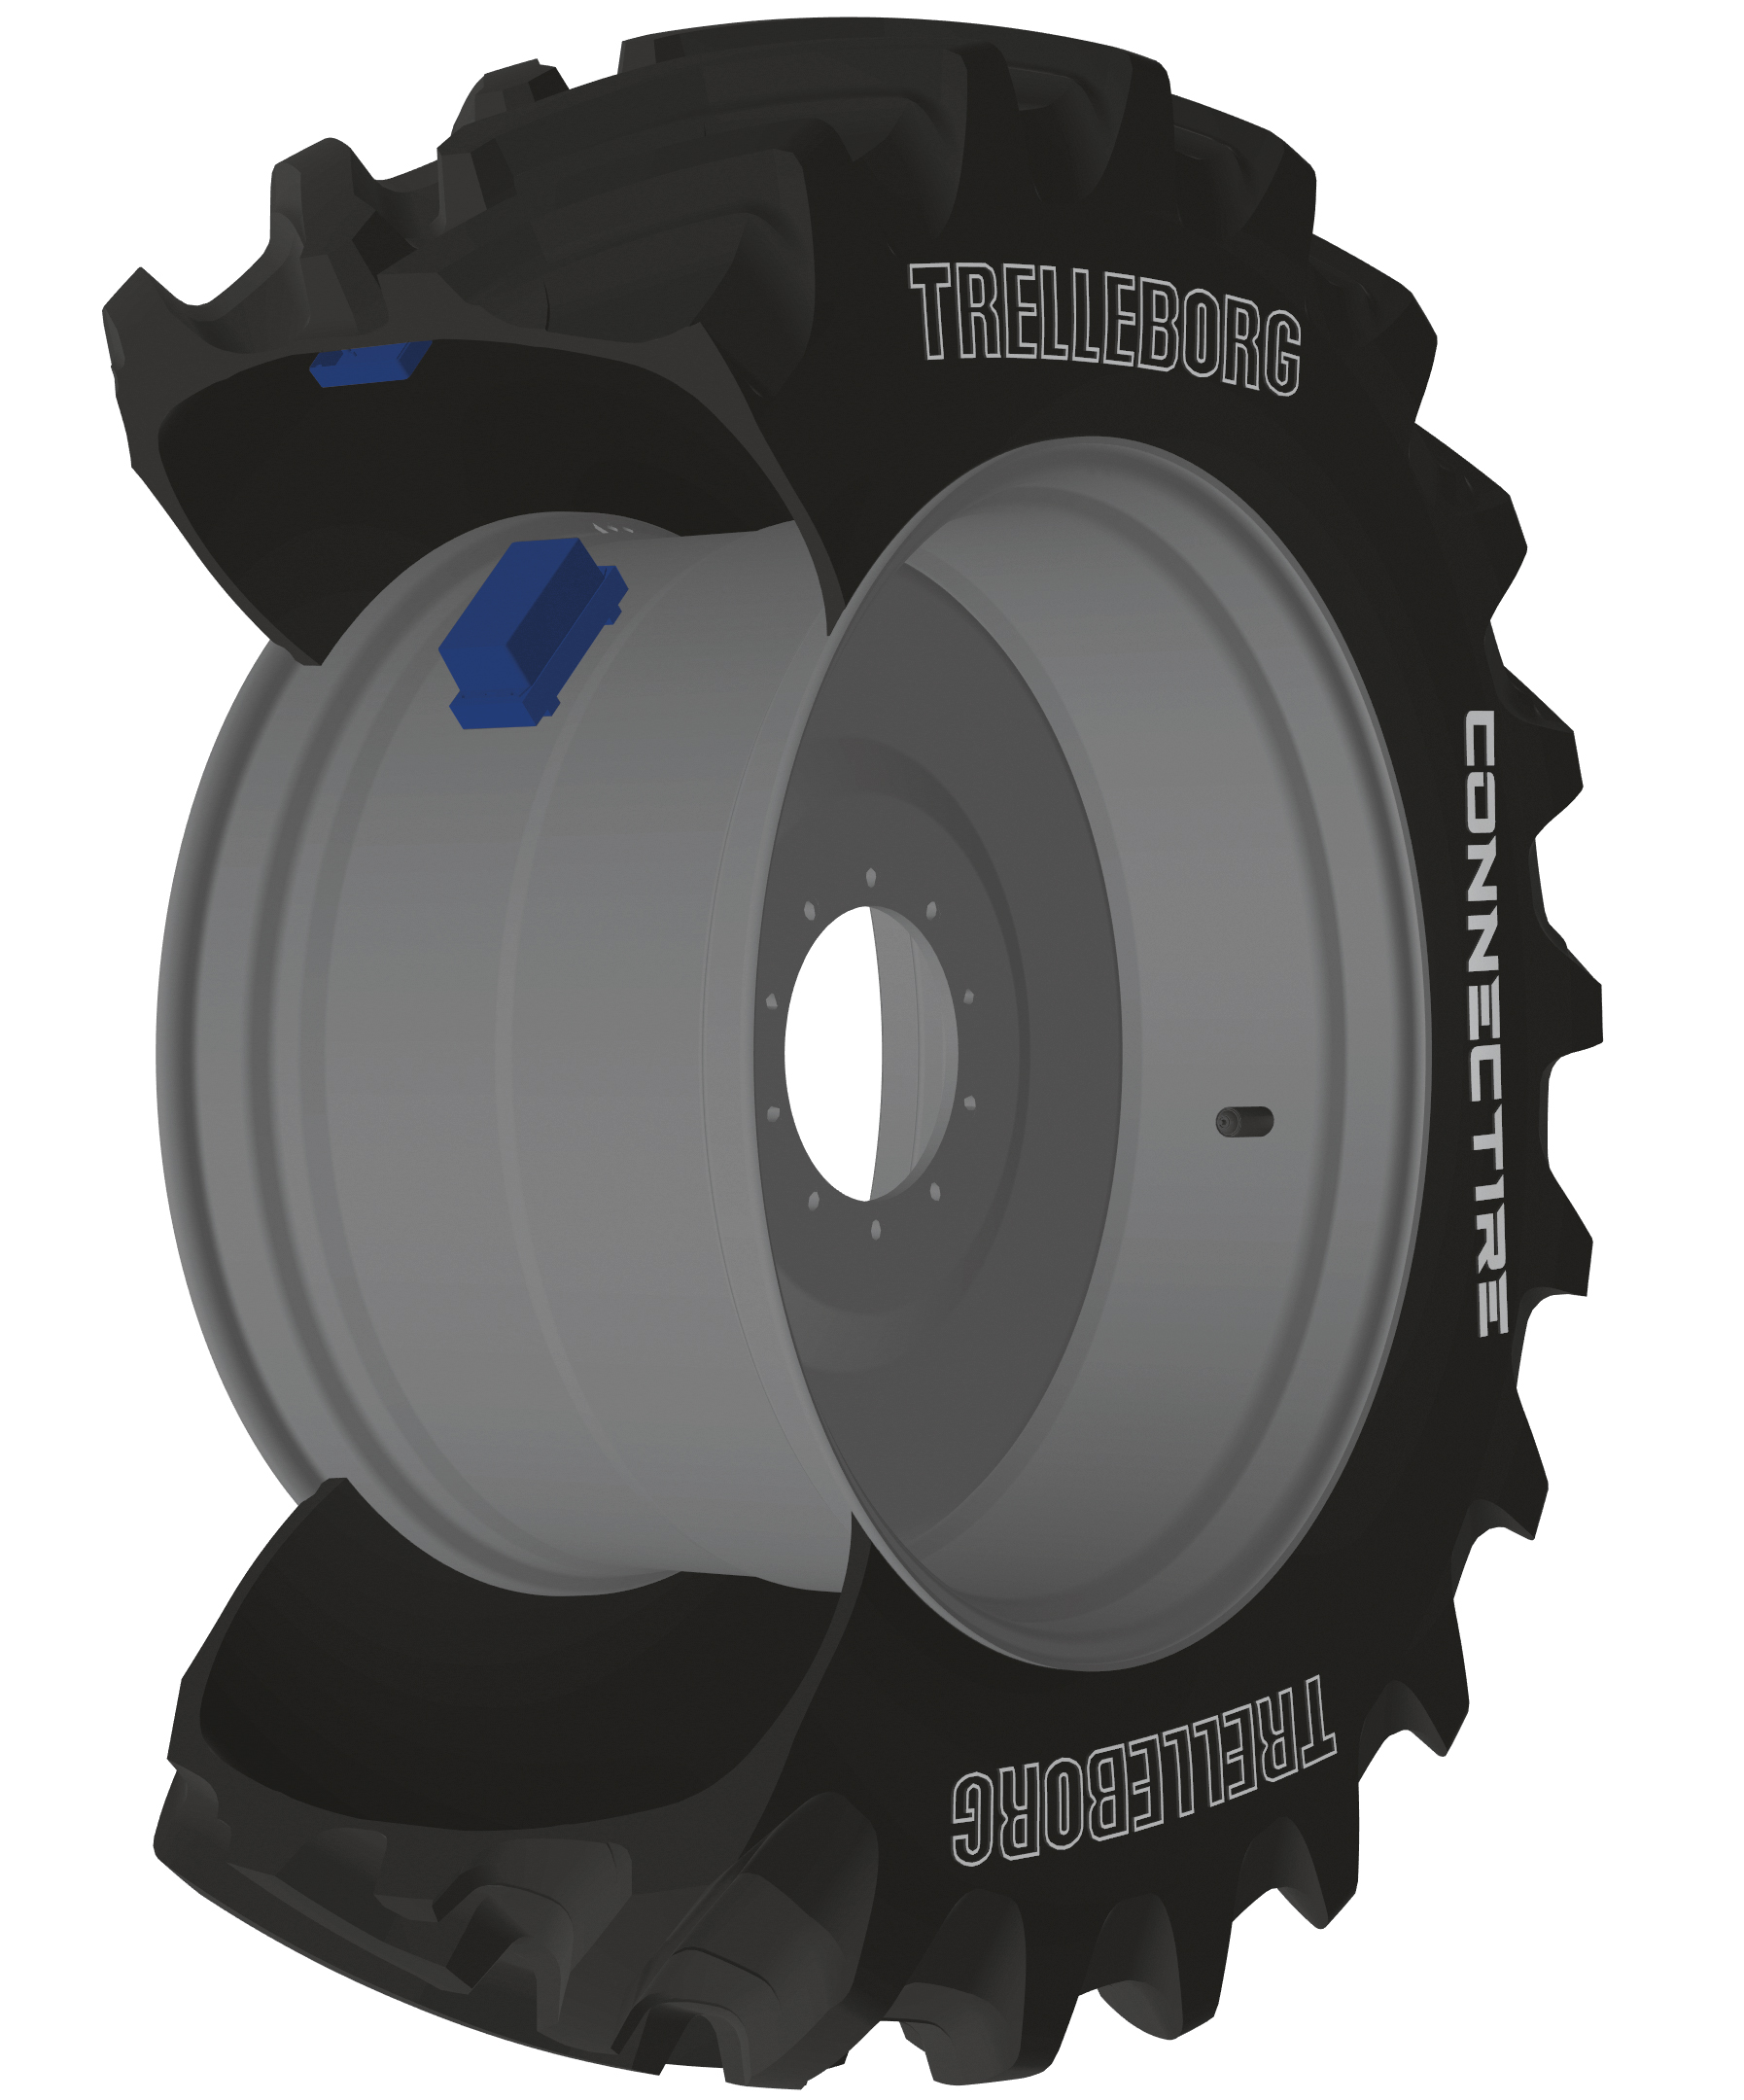 Trelleborg's ConnecTire Is a Smart Wheel for Farm Equipment